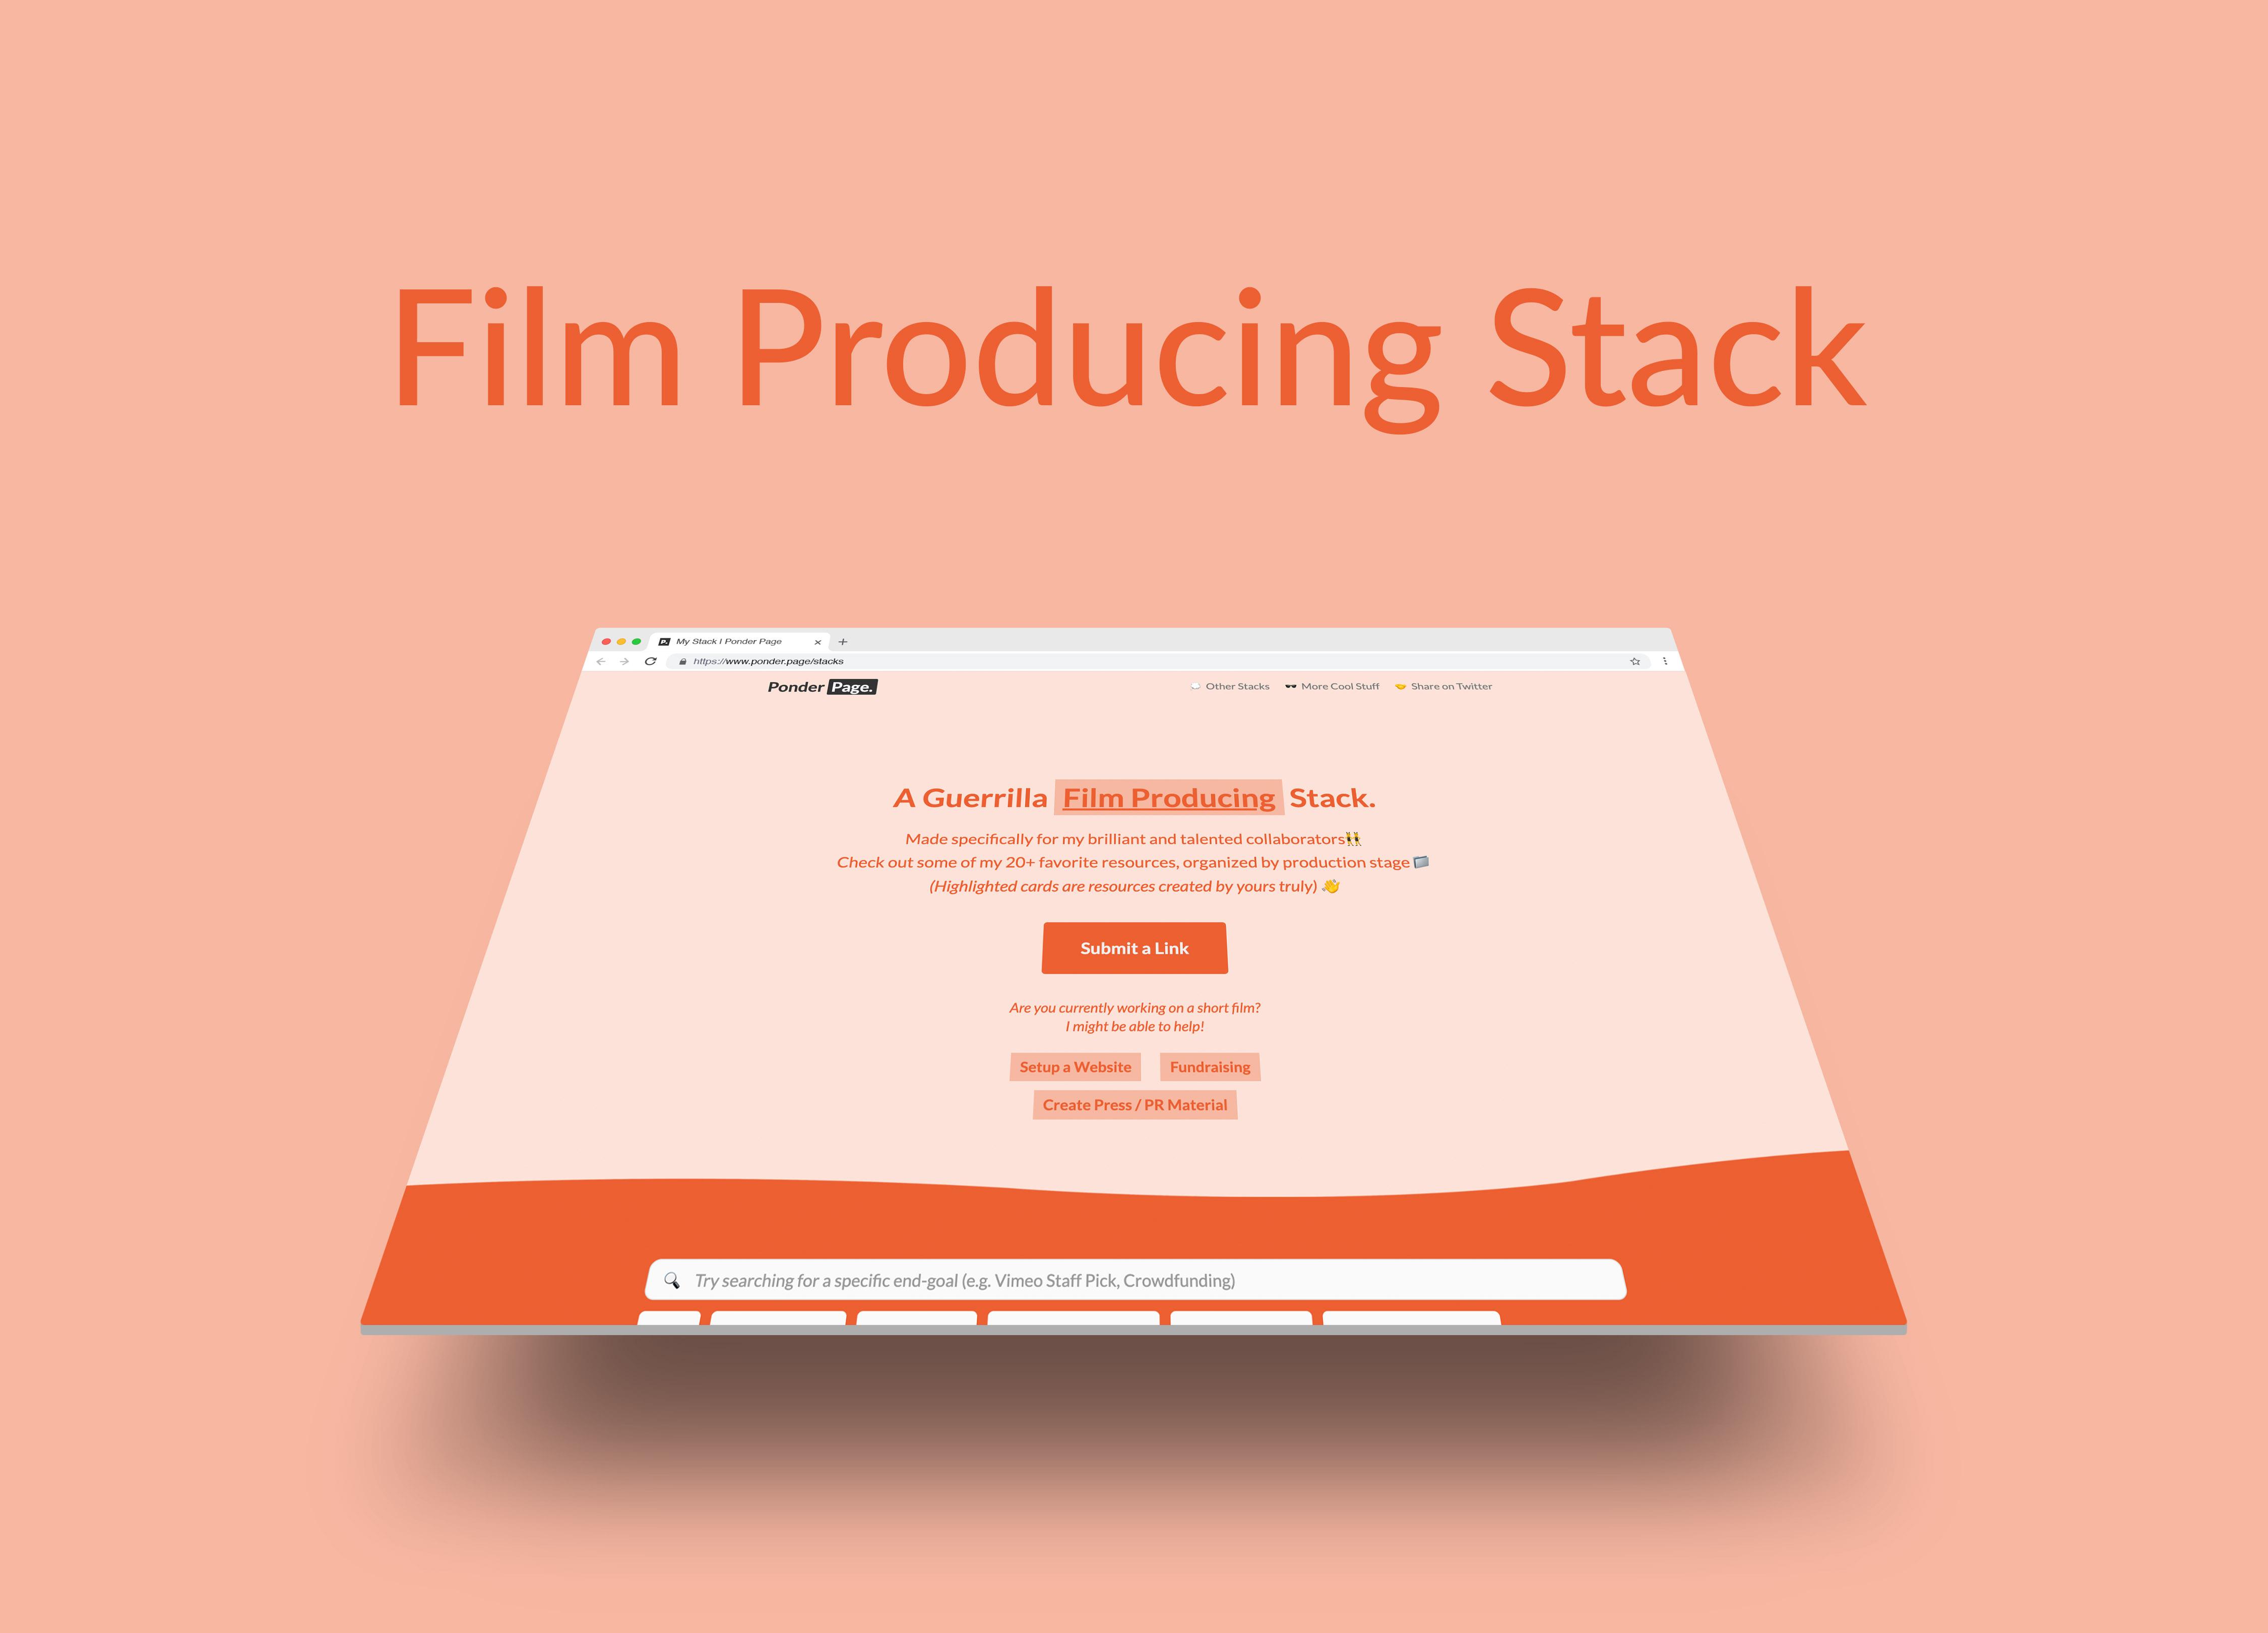 Mockup and link to Producing stacks.